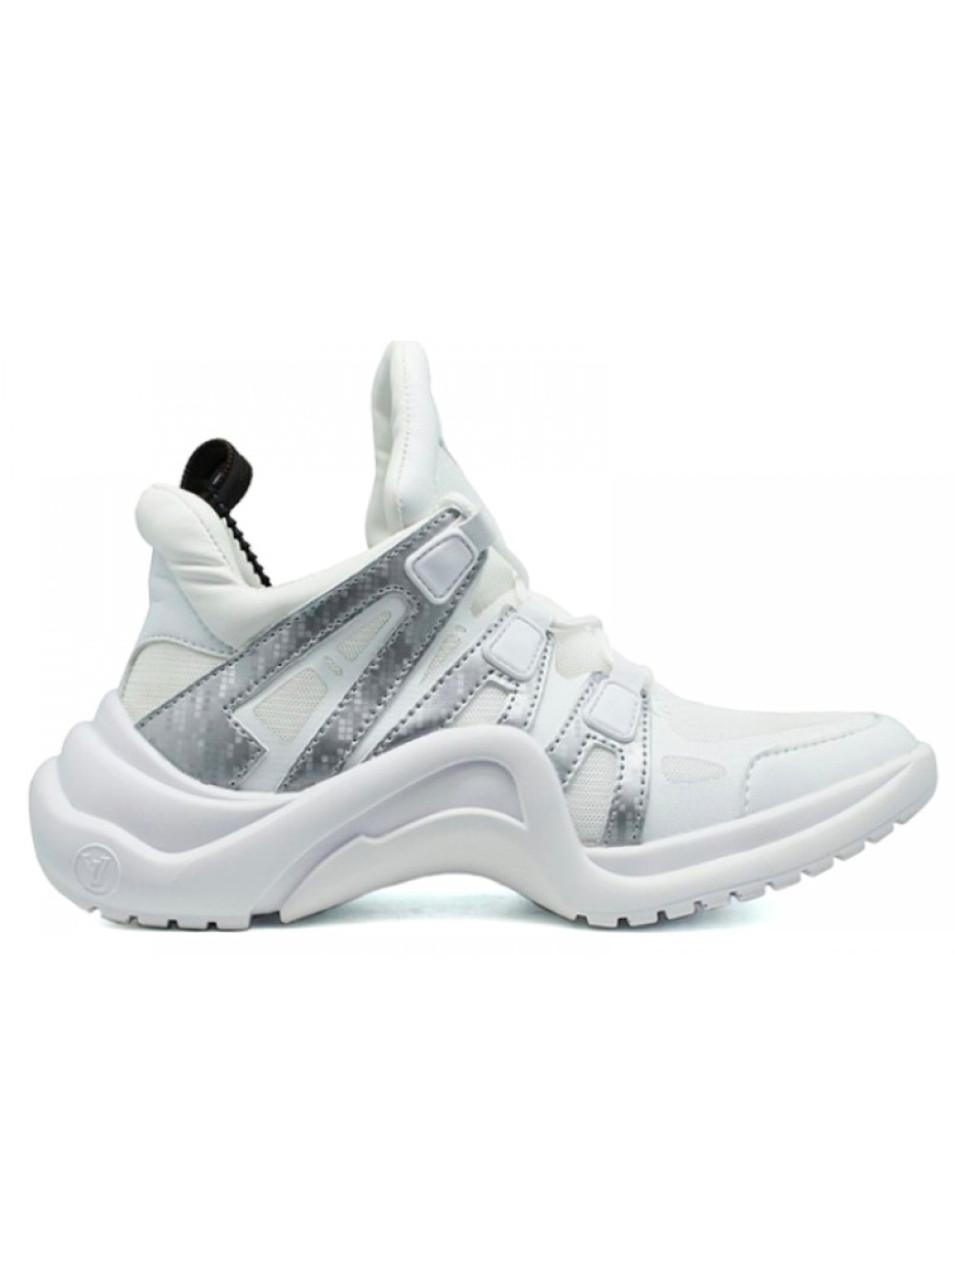 4fa624aeca4b Мужские кроссовки LV Louis Vuitton Archlight белые с серебром - Интернет  магазин krossovkiweb.kiev.